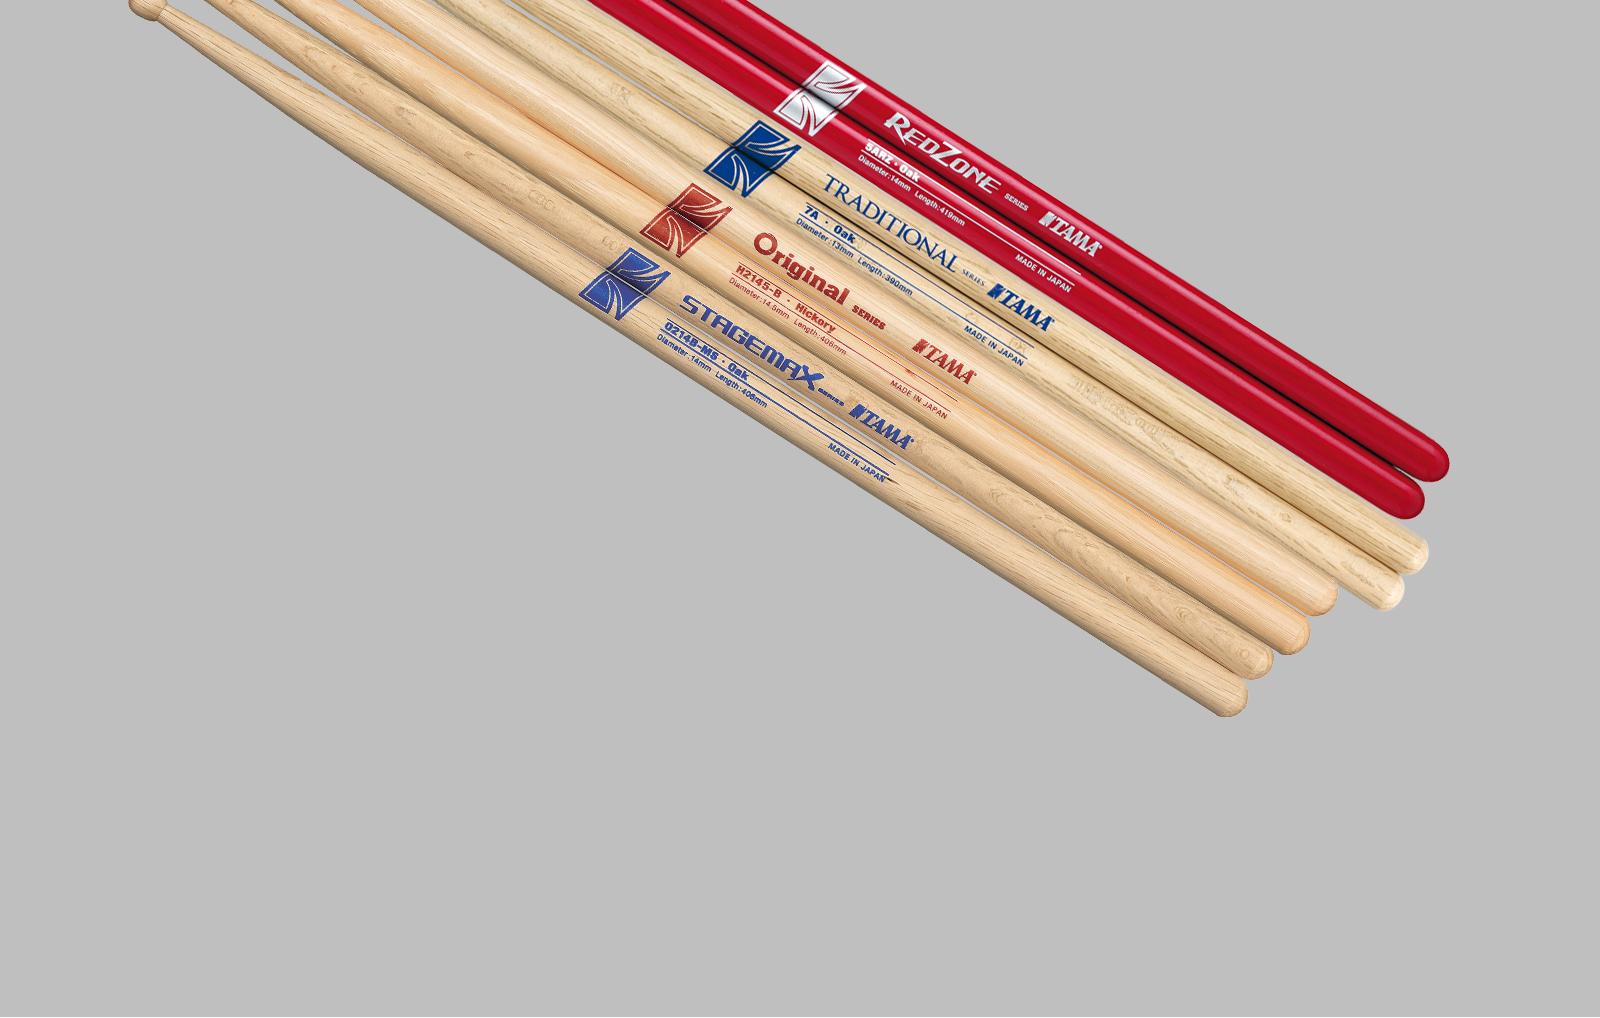 sticks products tama drums tamaドラム公式サイト